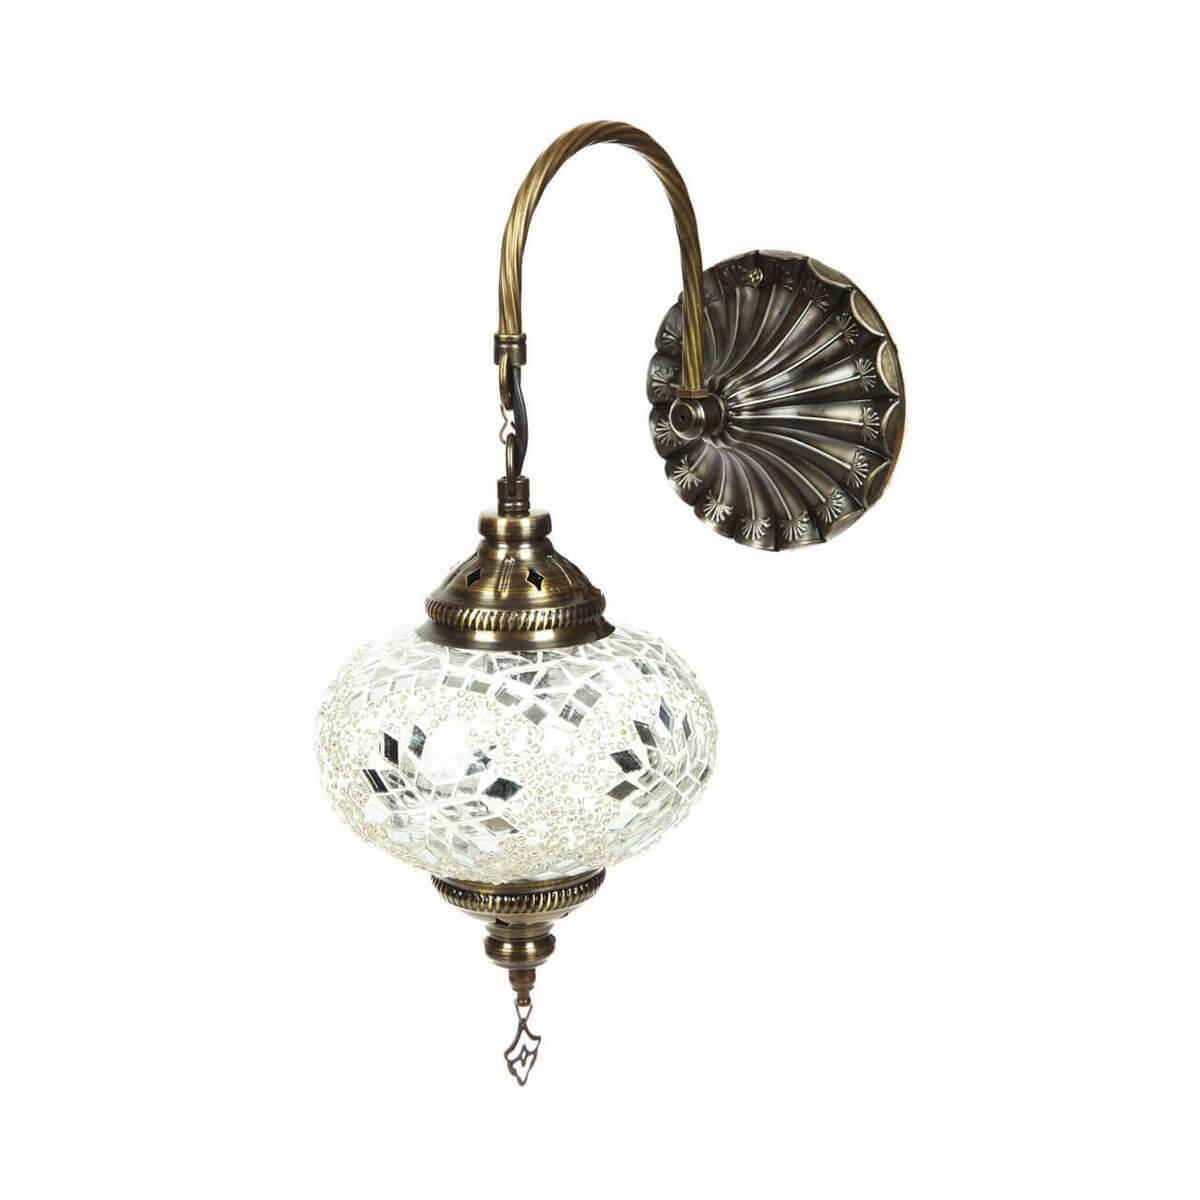 Бра Kink Light 0815T,01 Марокко косметика из марокко купить